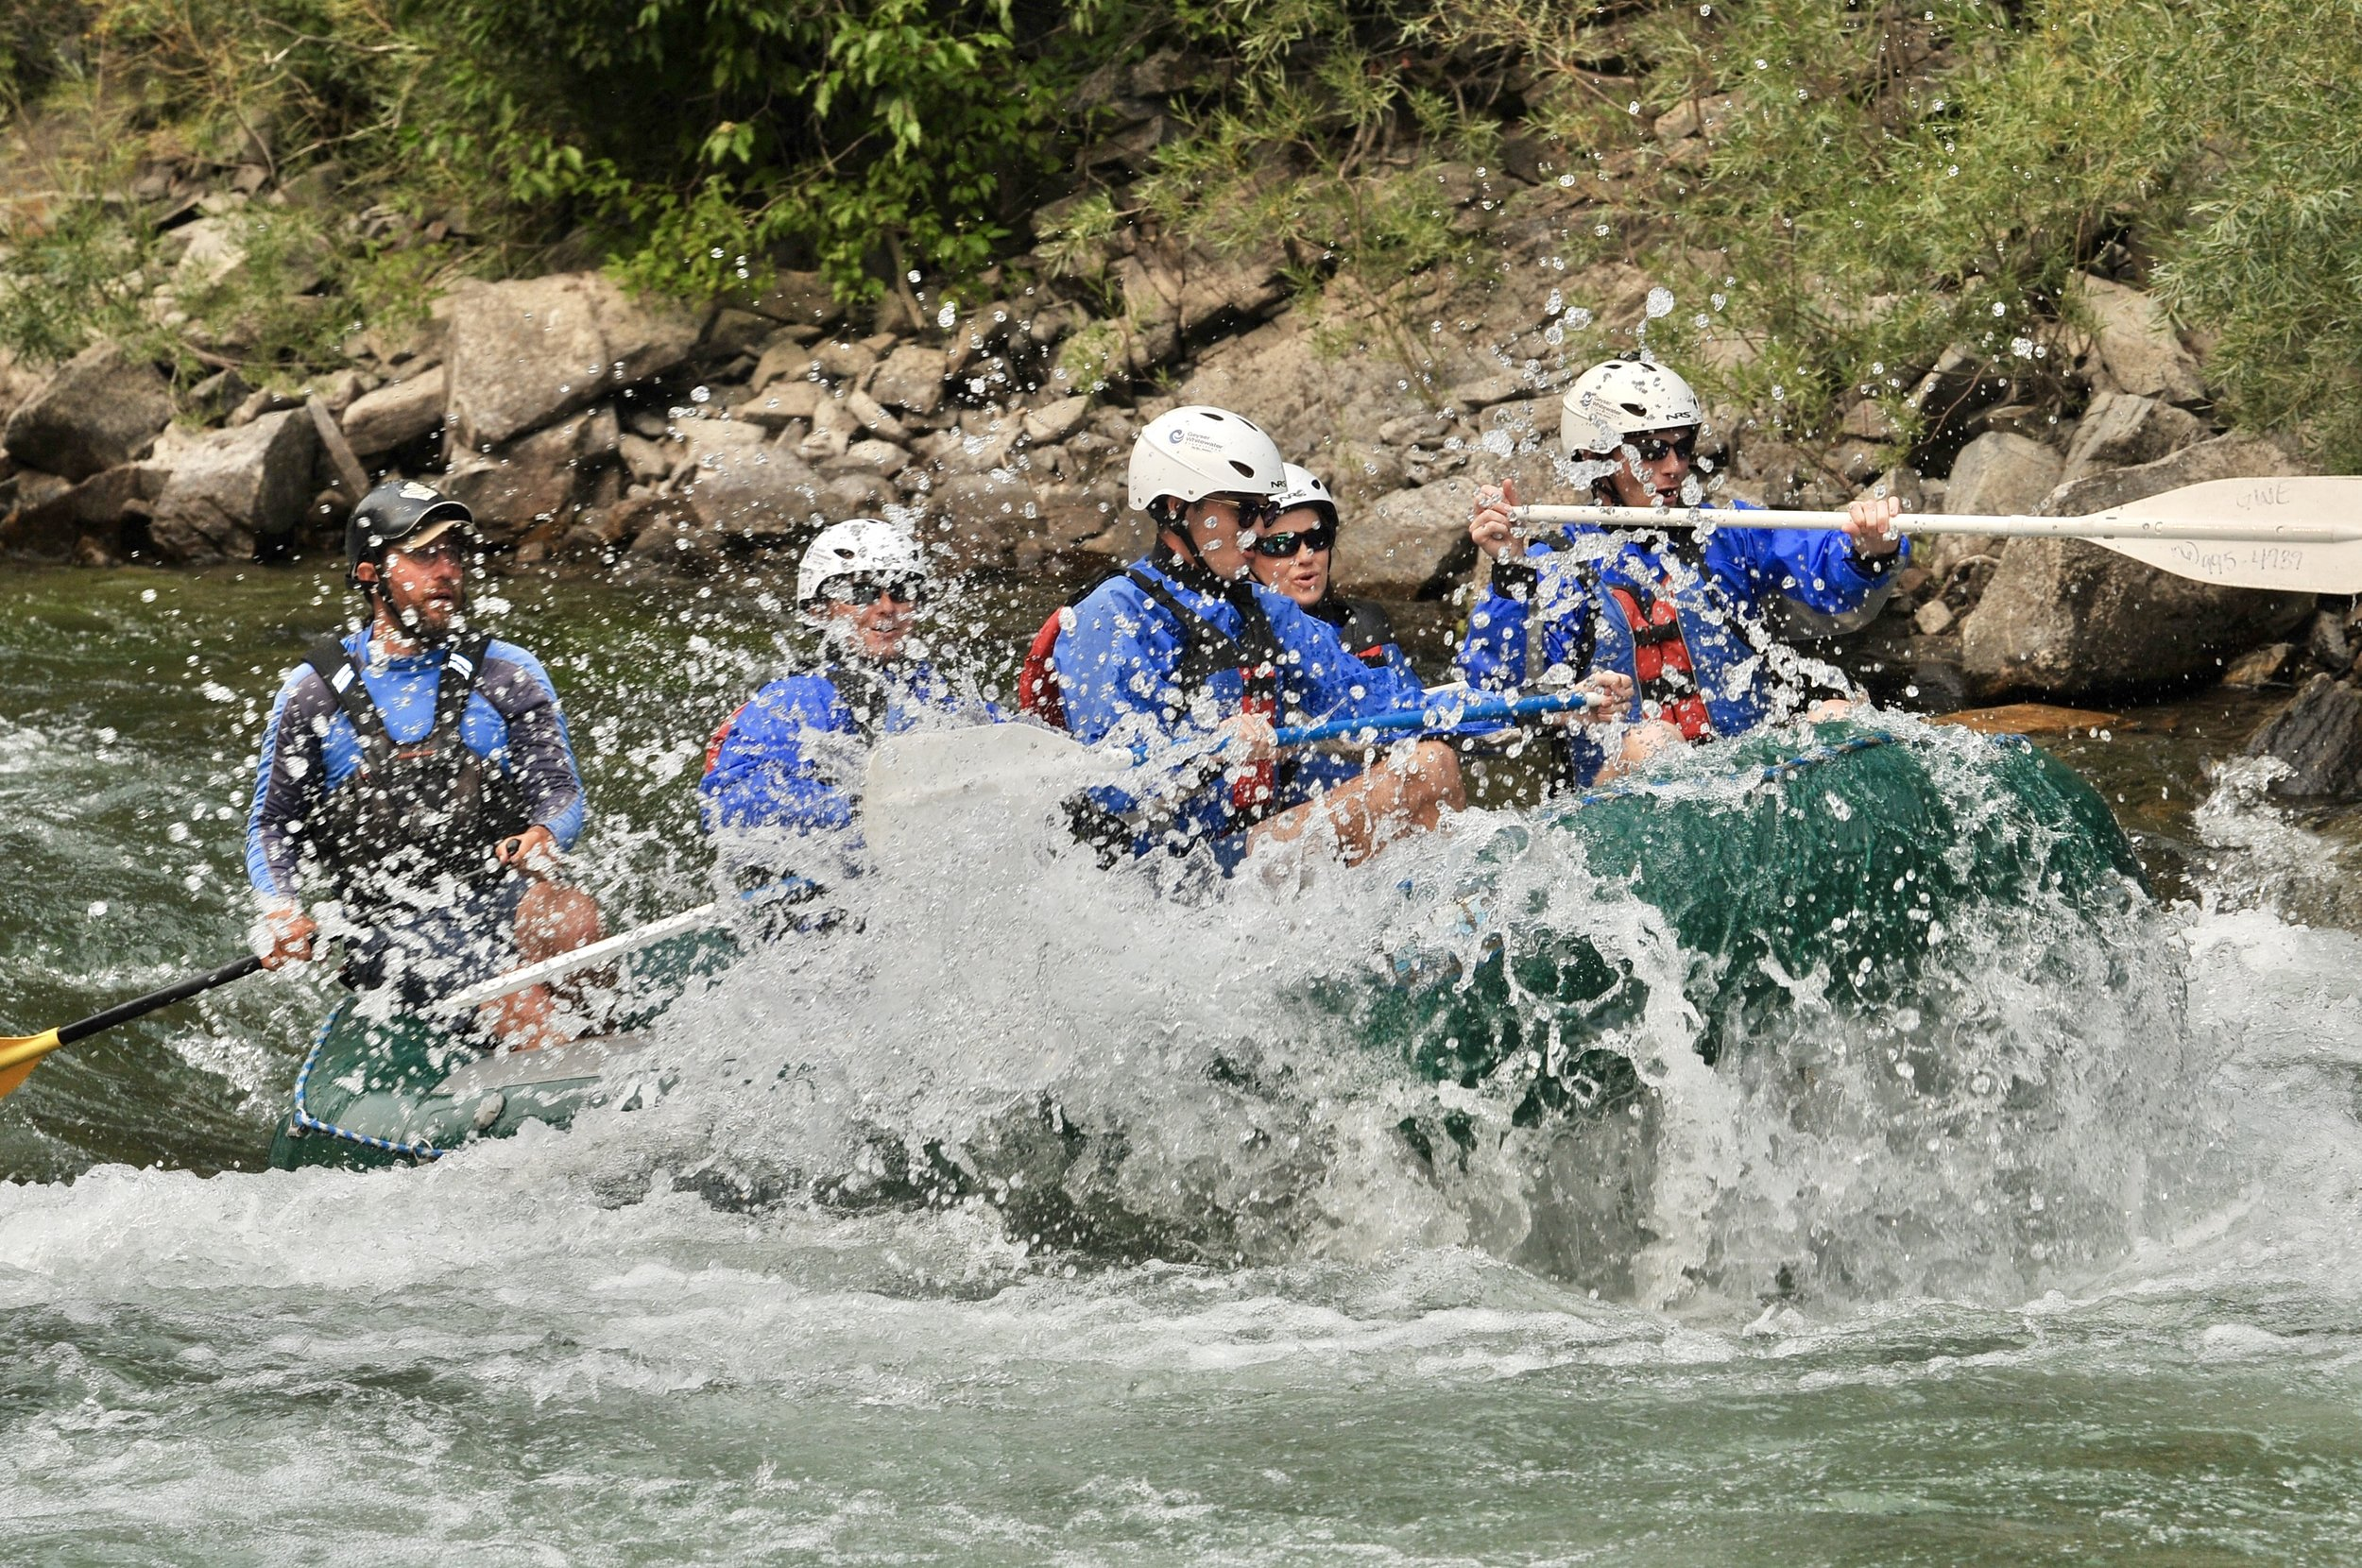 White water rafting in Buena Vista, Colorado